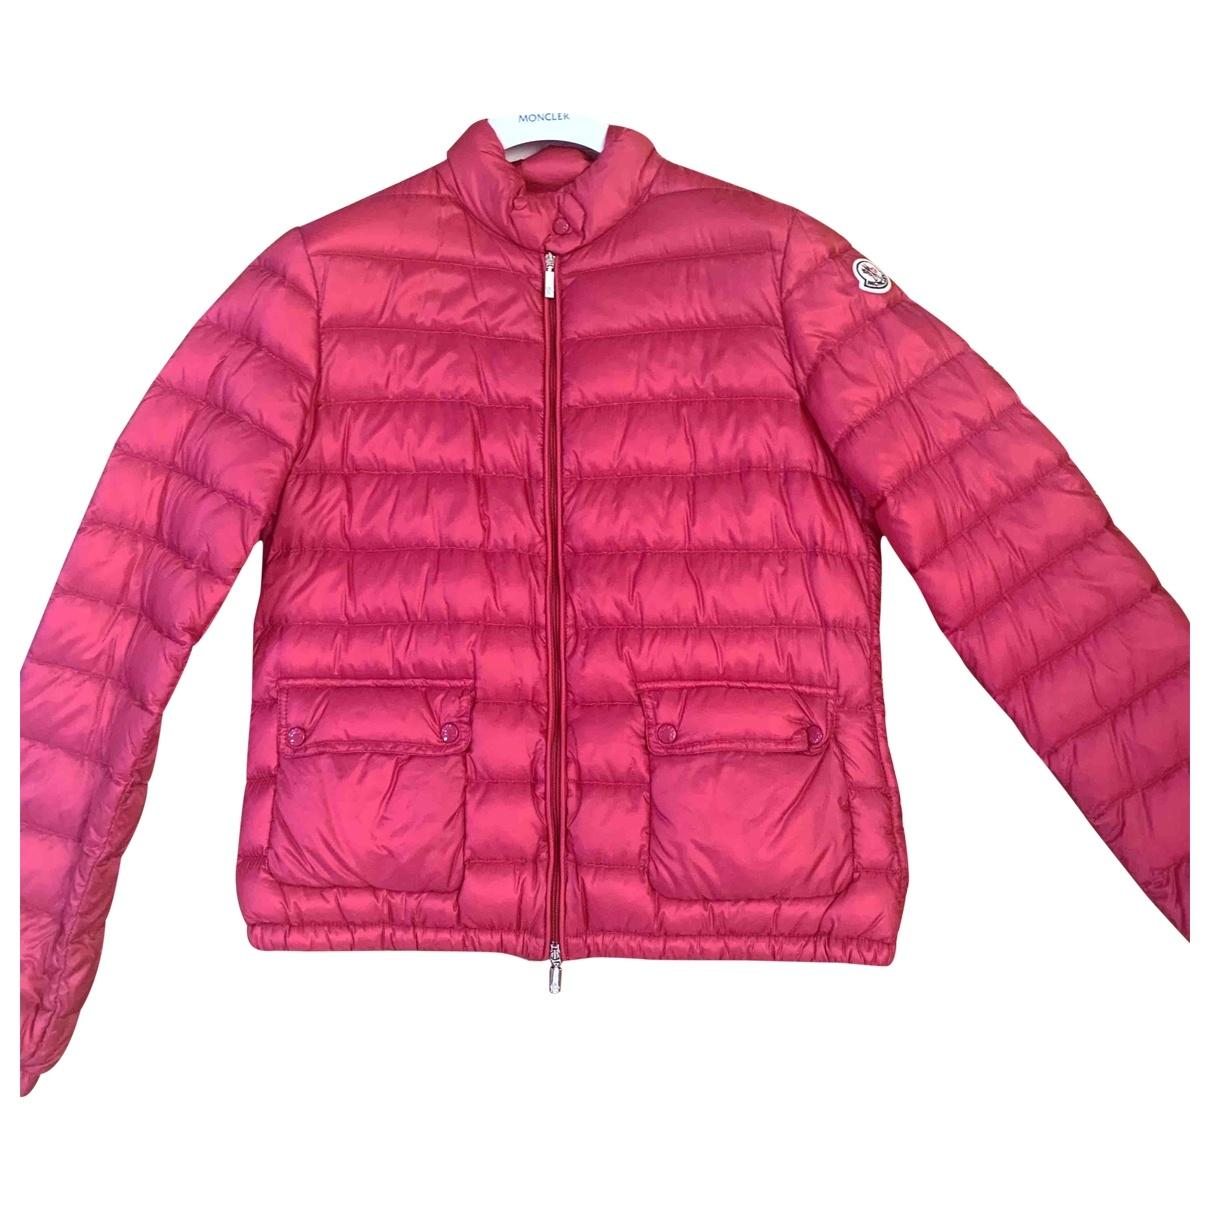 Moncler \N Jacke in  Rosa Polyester